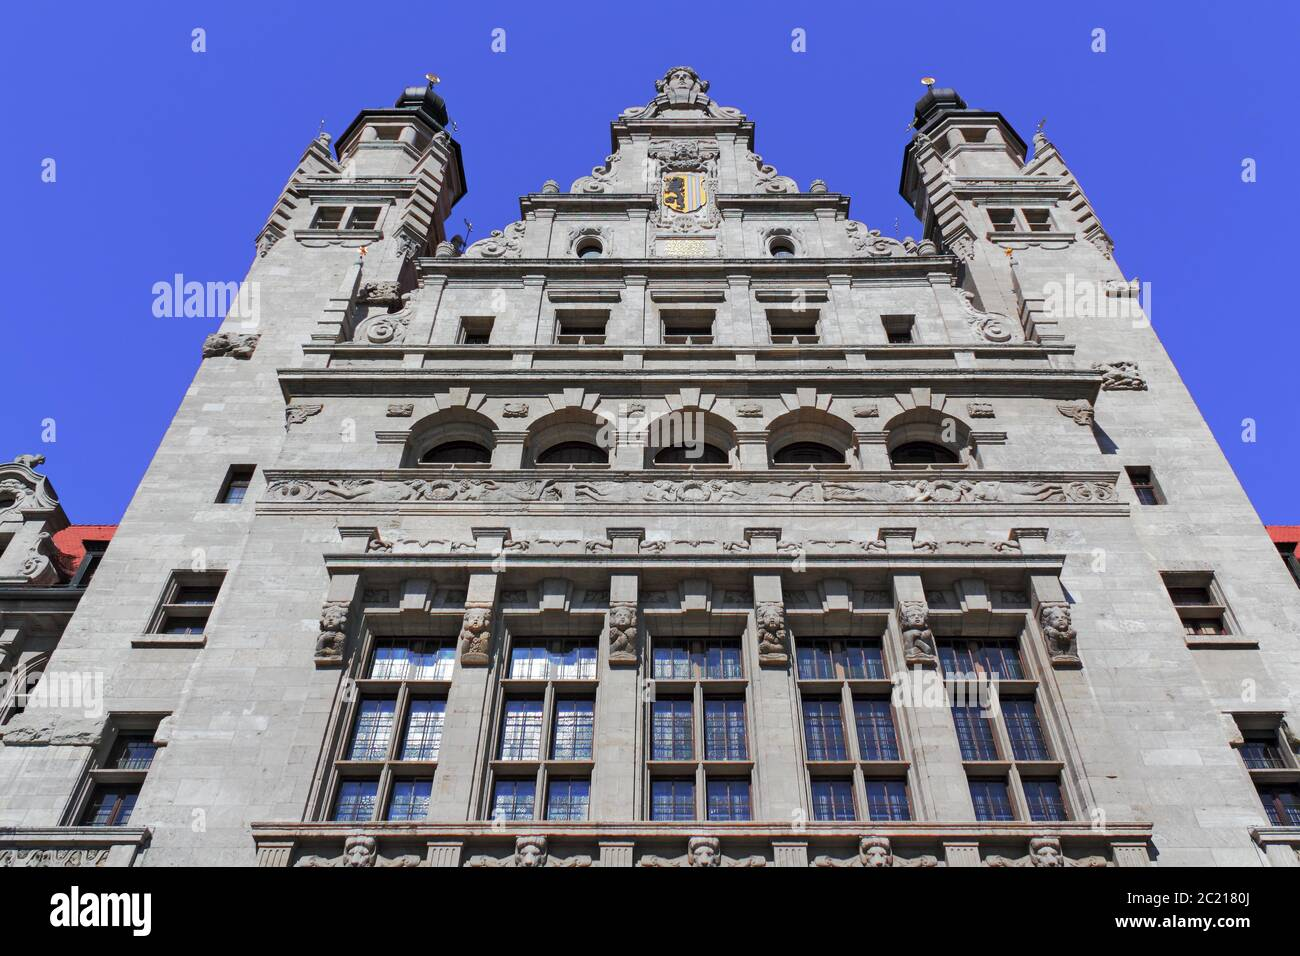 Leipzig New Town Hall Stock Photo Alamy